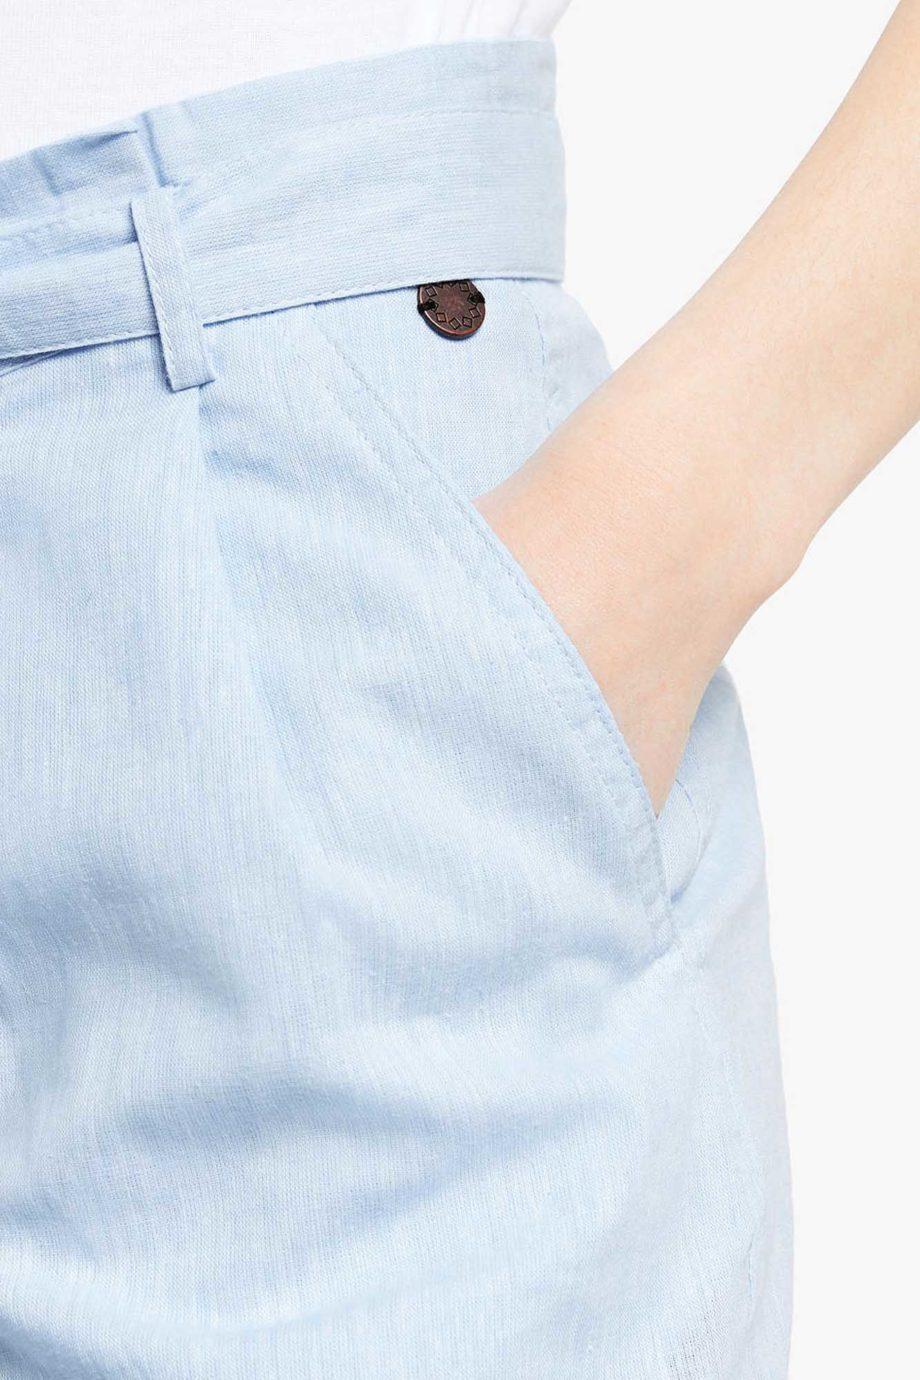 NUMPH shorts kristin detalle